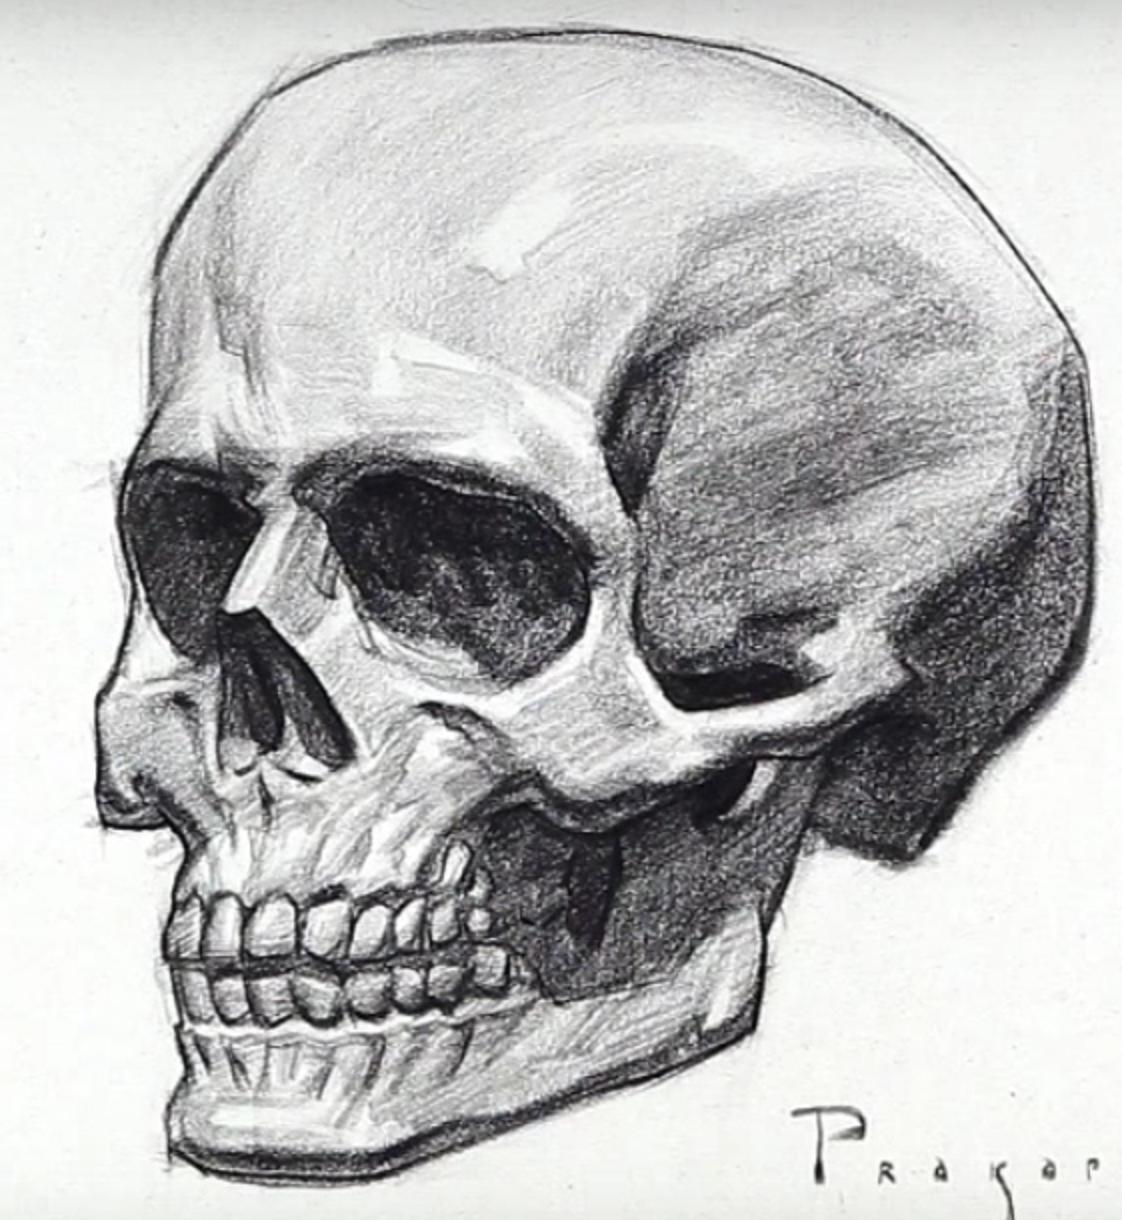 картинки черепа со всех сторон данного